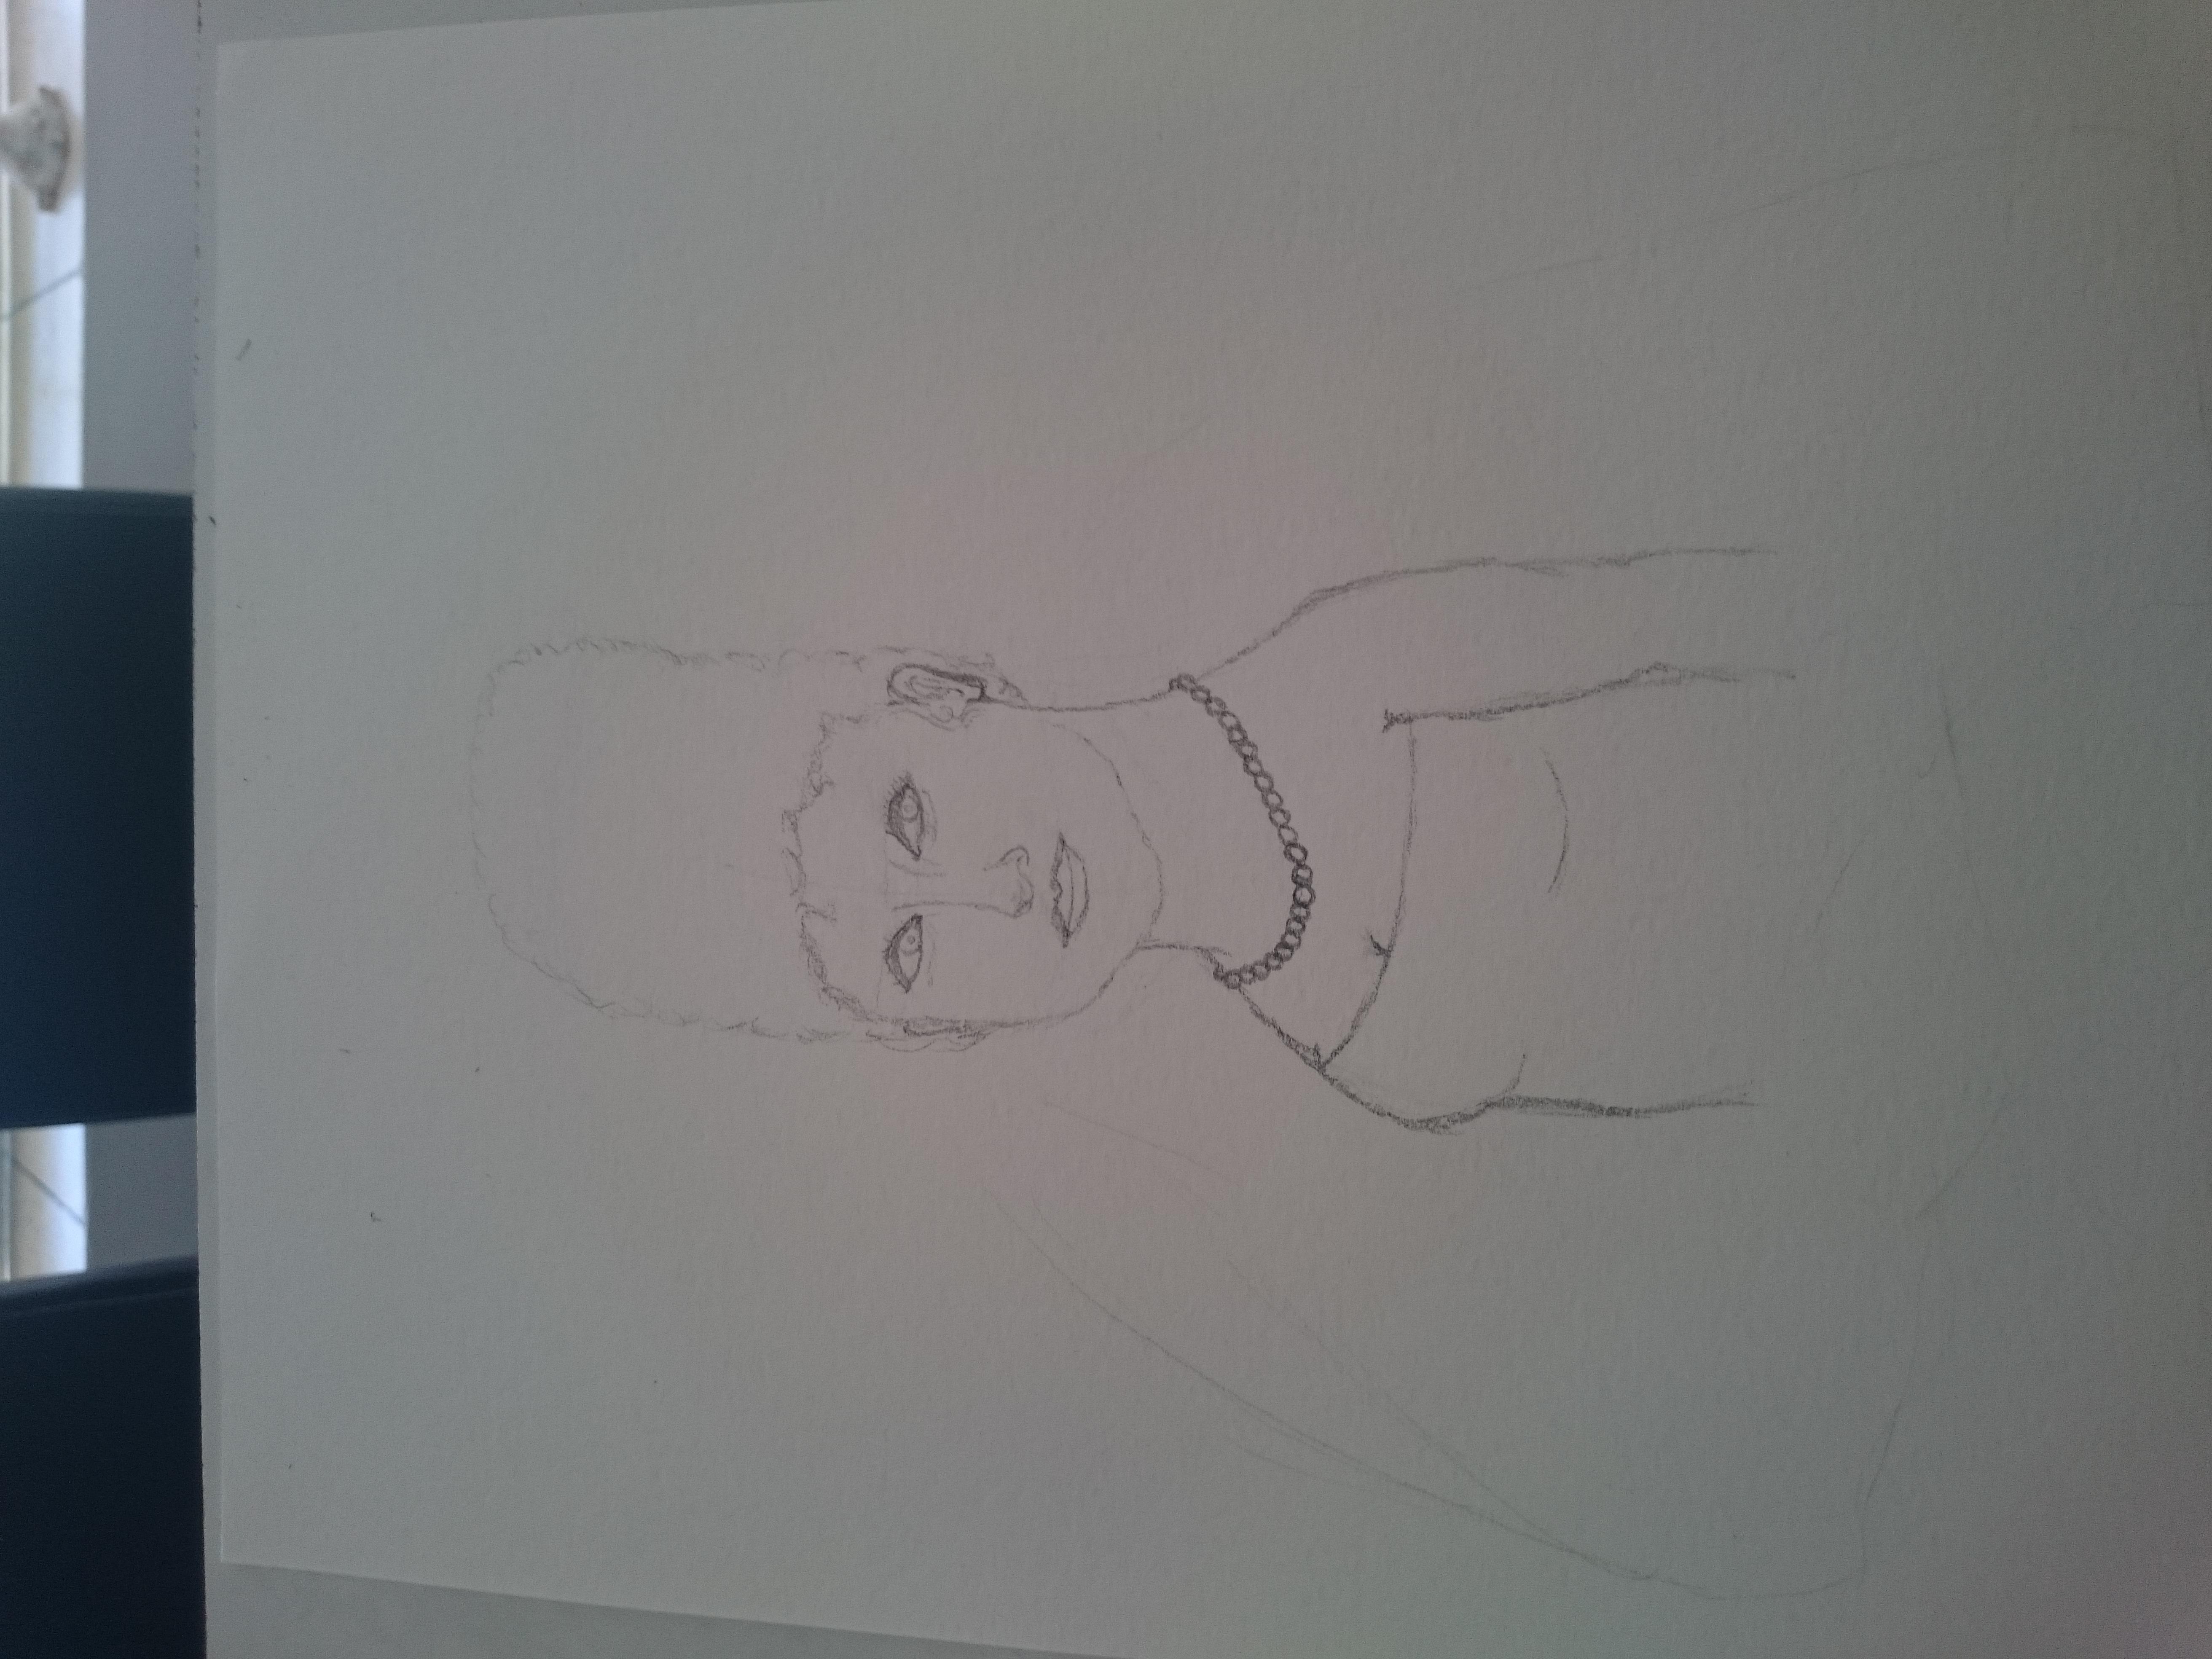 Marge Simpson X Mona Lisa (sketch)